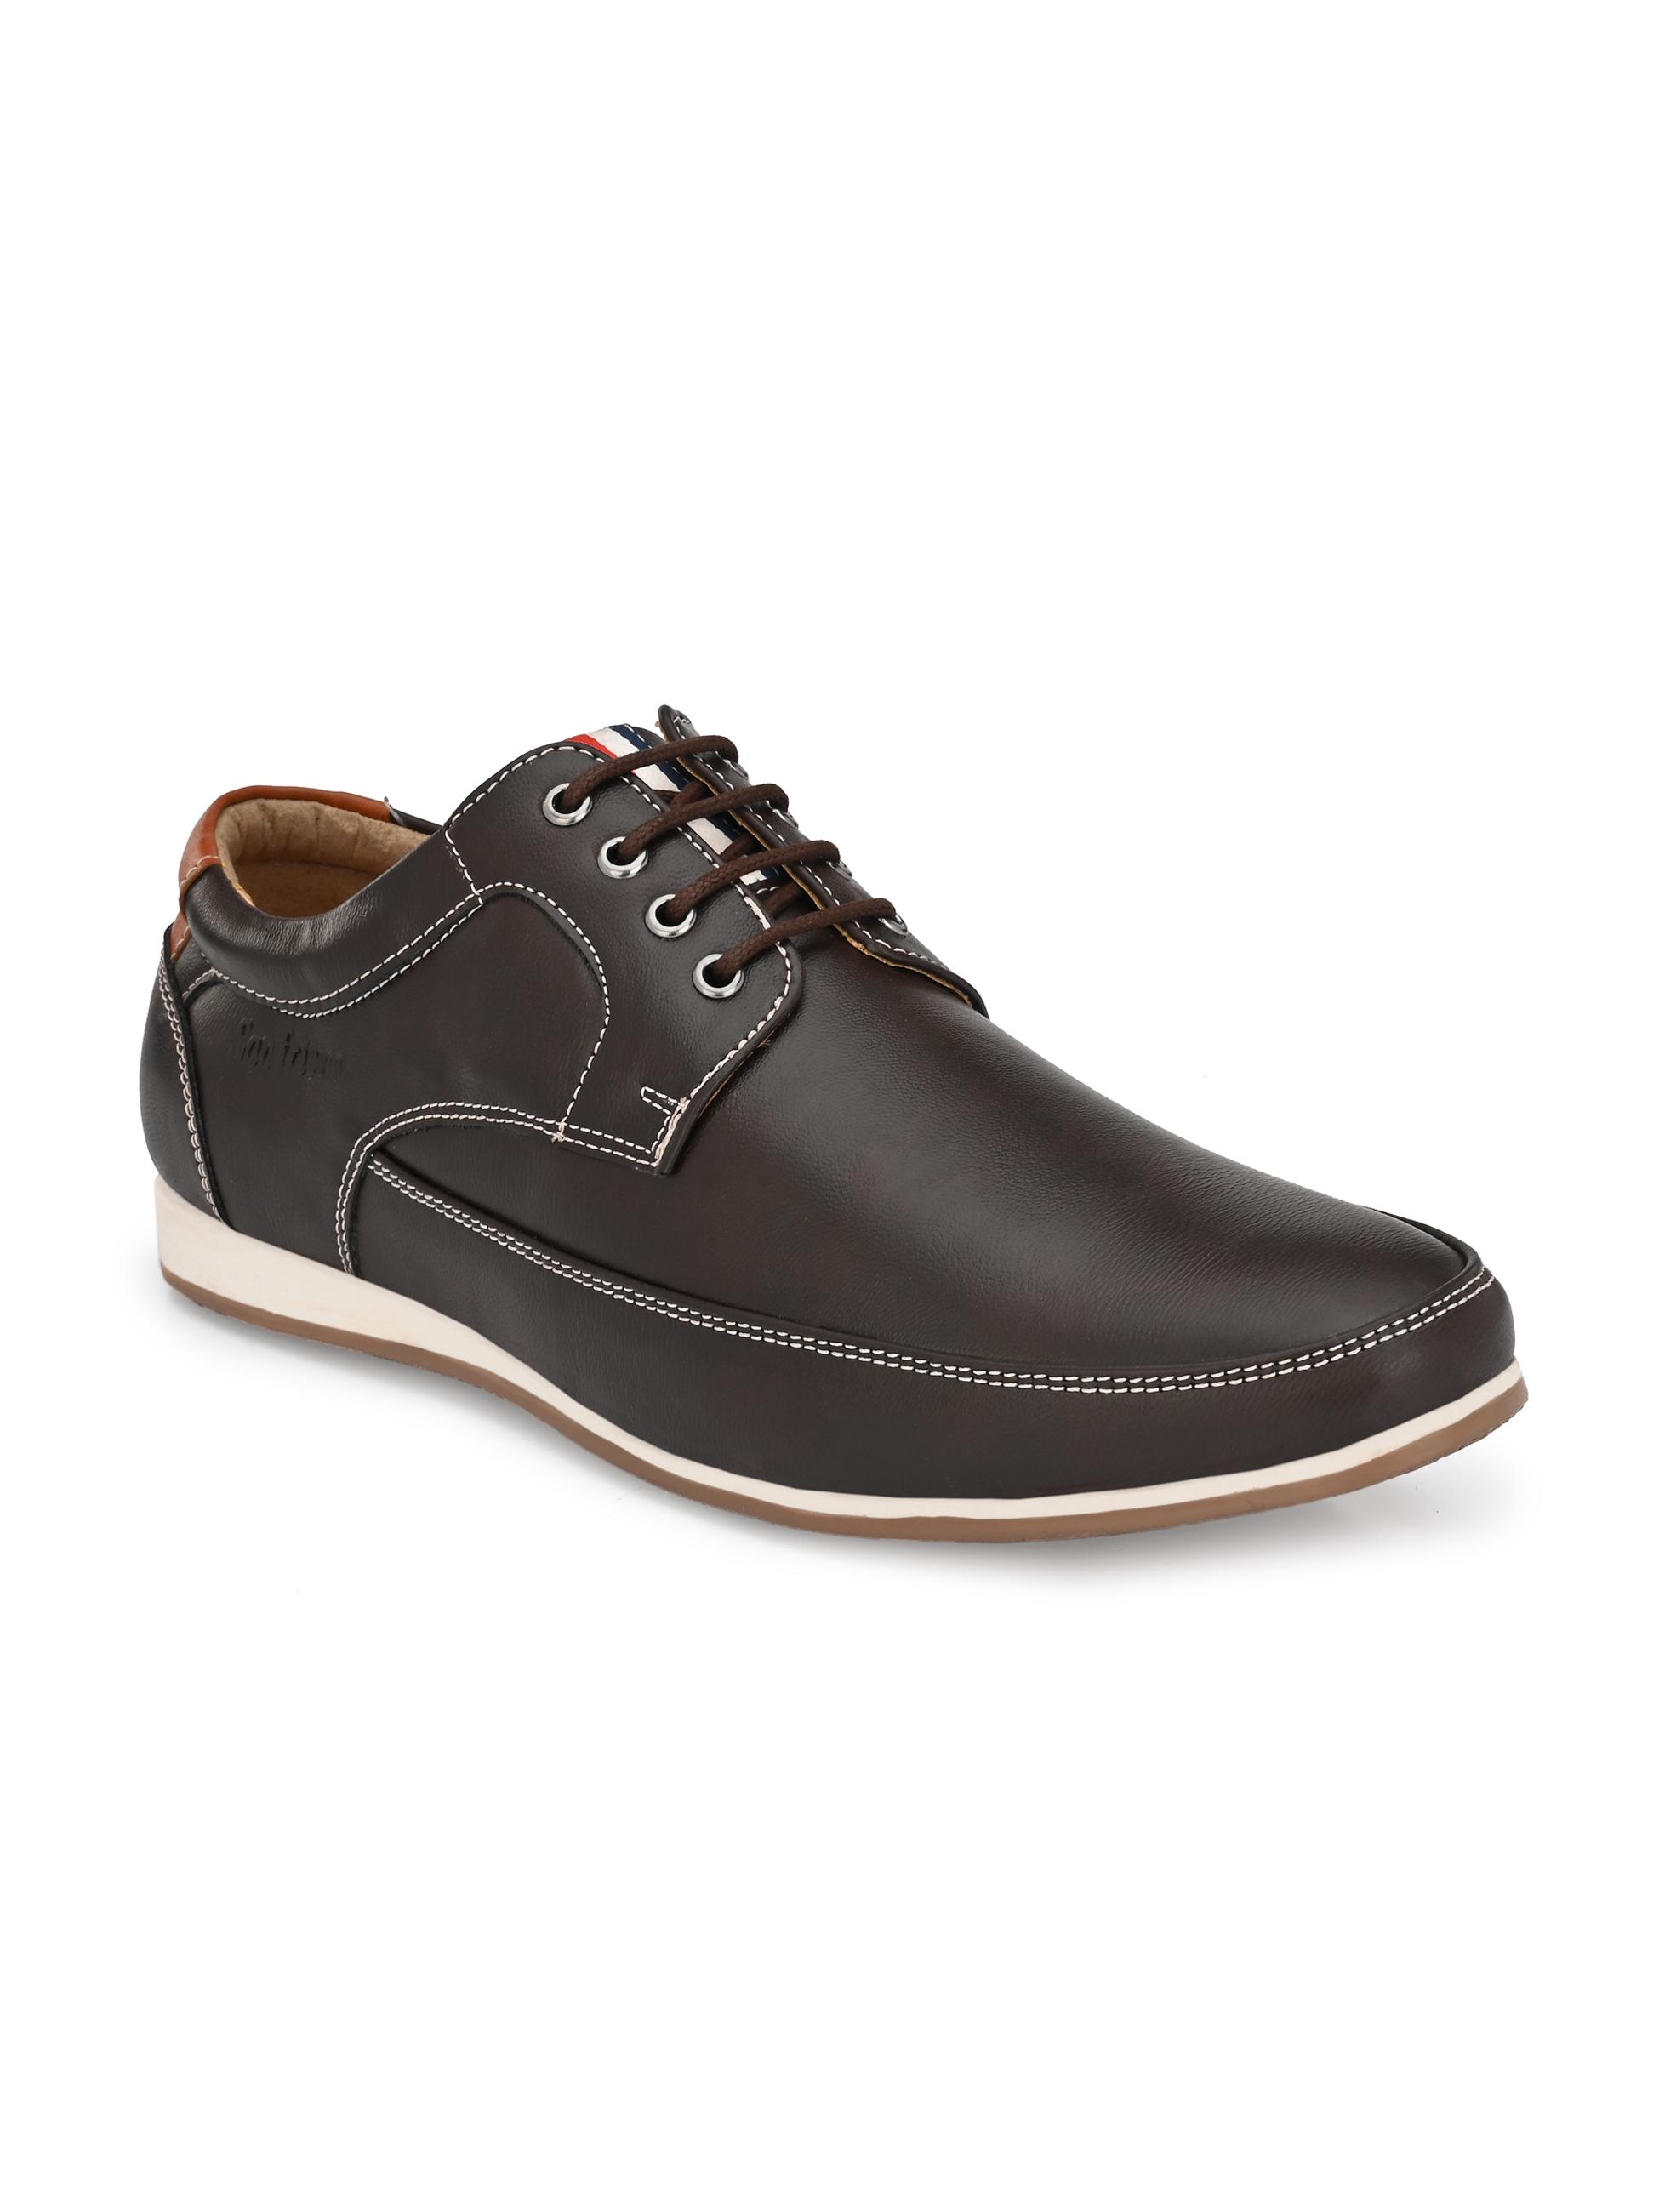 San Frissco | San Frissco Carter Brown Sneakers